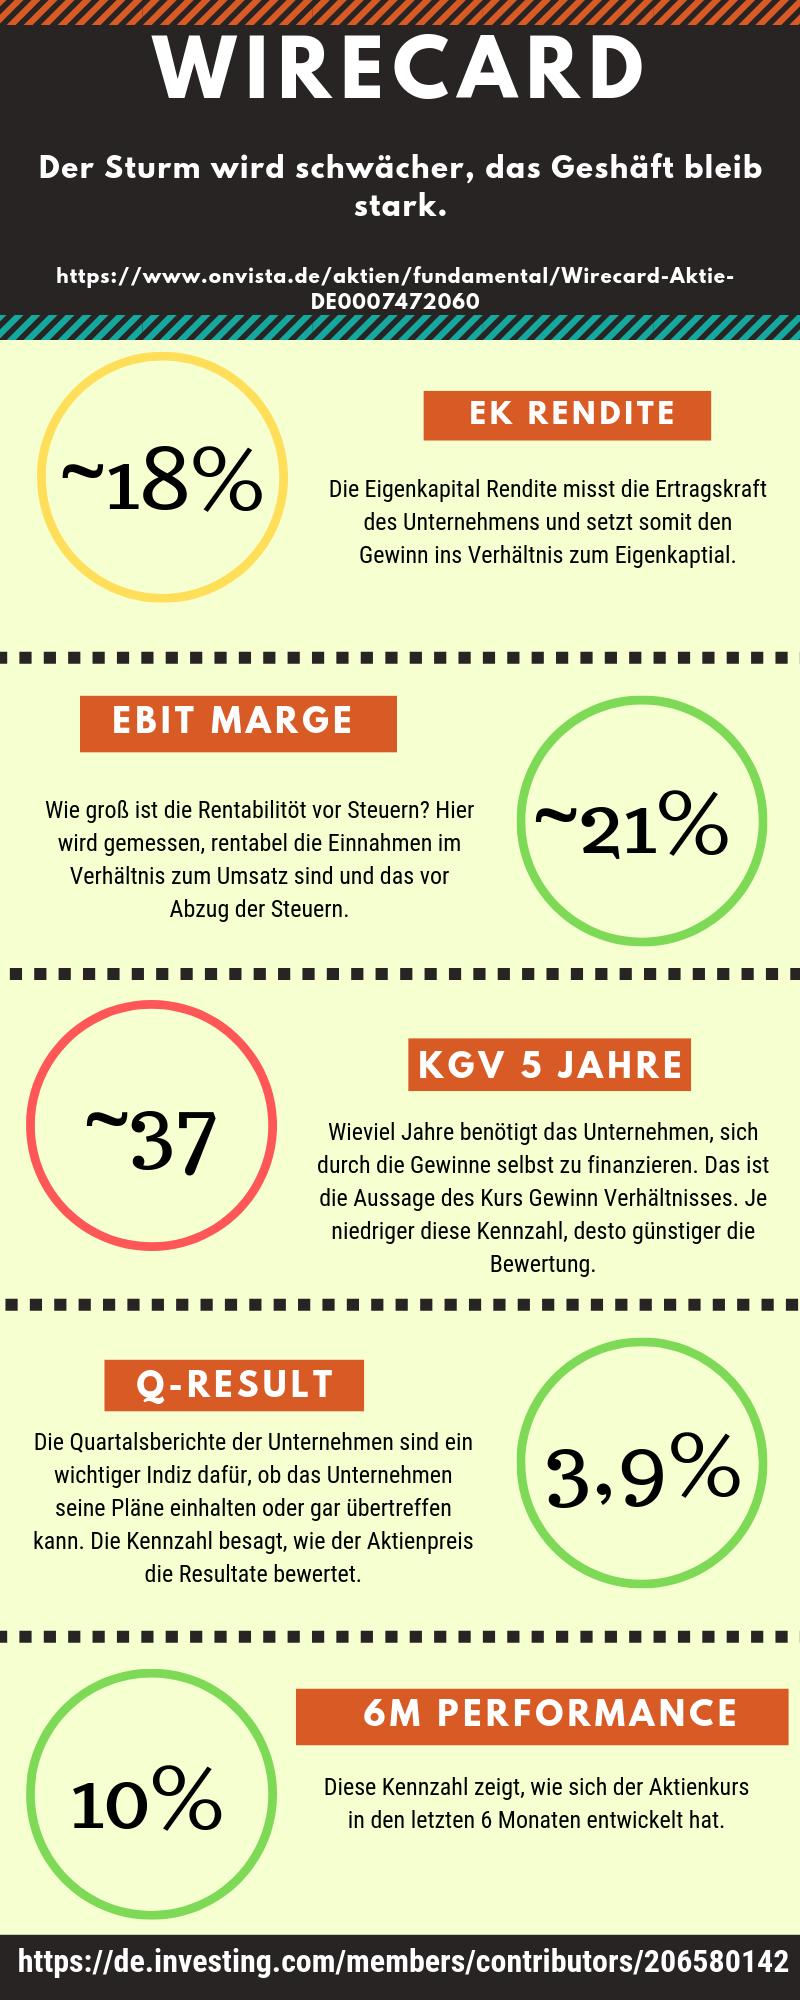 Wirecard: Infografik